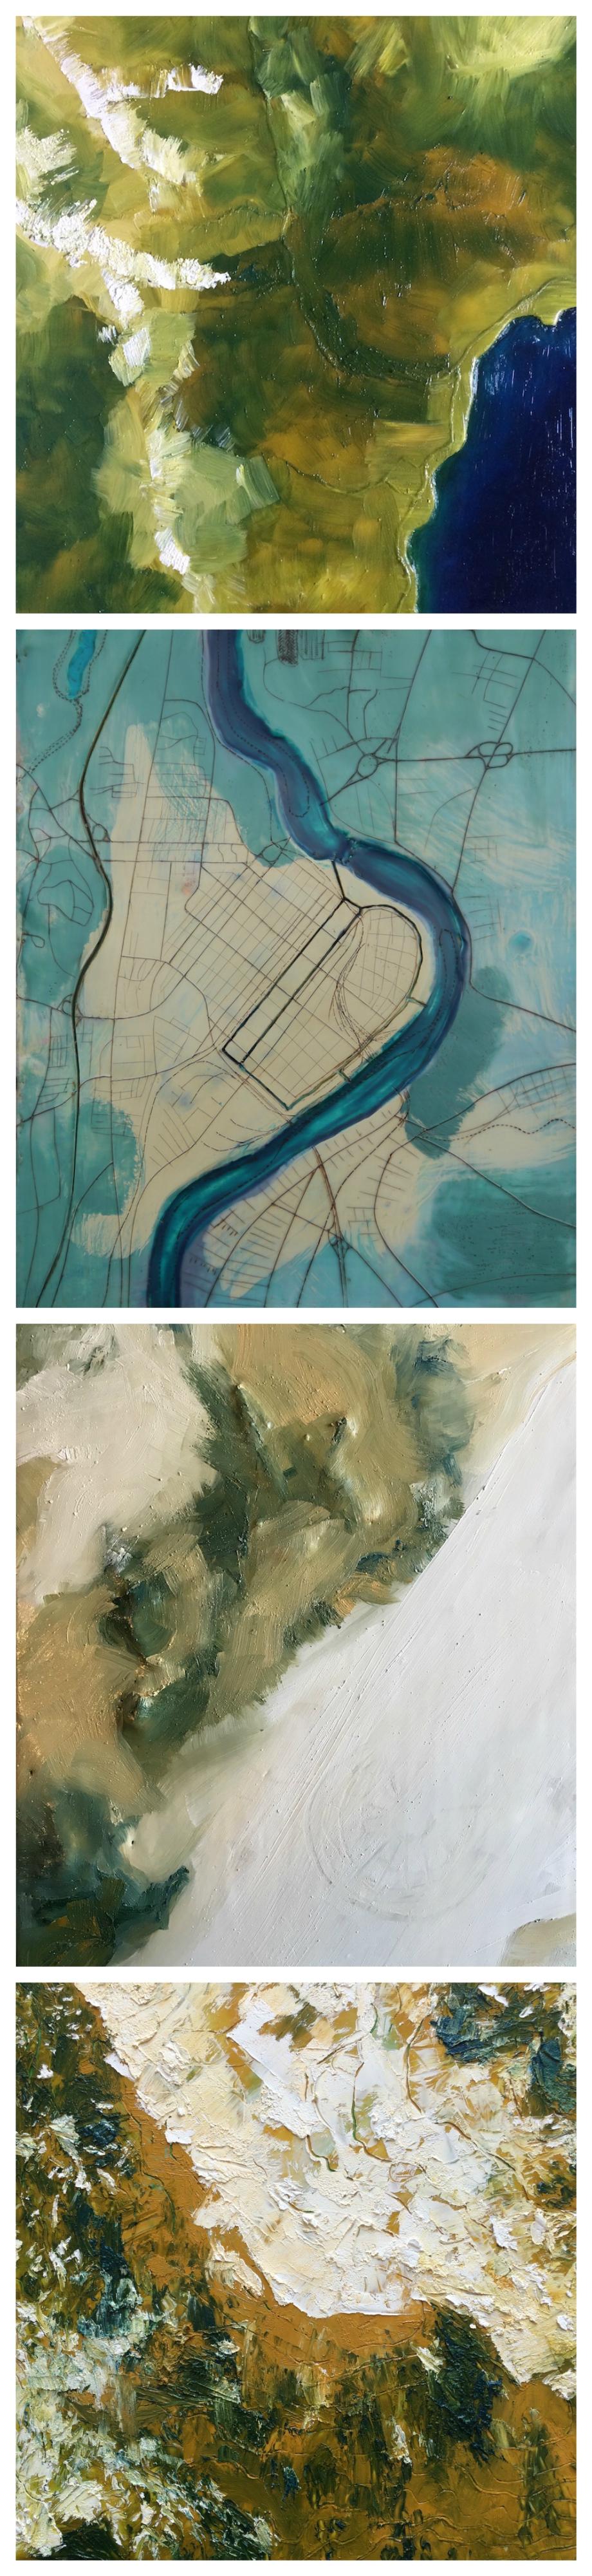 Top to bottom: Squaw Valley, Lake Tahoe, California; Holyoke, Massachusetts; The Playa, Black Rock Desert, Nevada; Mt. Rose, Nevada